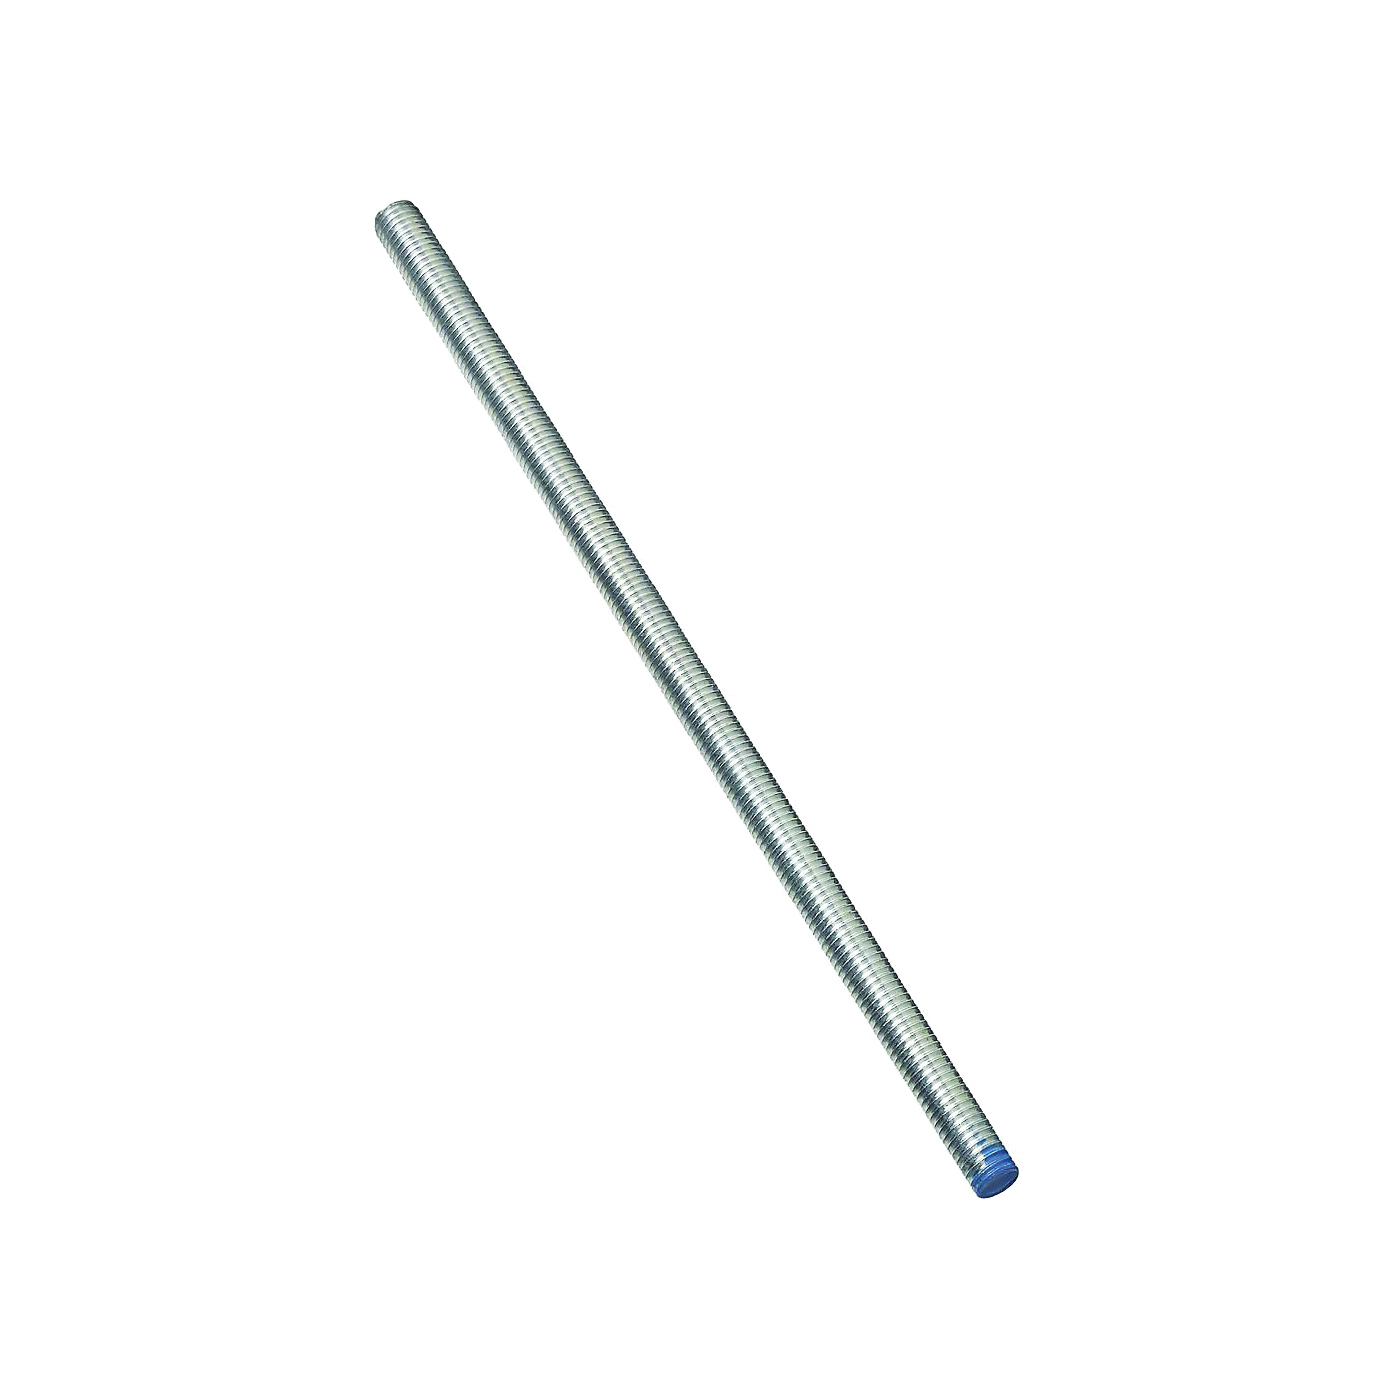 Picture of Stanley Hardware 179622 Threaded Rod, 1/2-13 Thread, 72 in L, A Grade, Steel, Zinc, UNC Thread